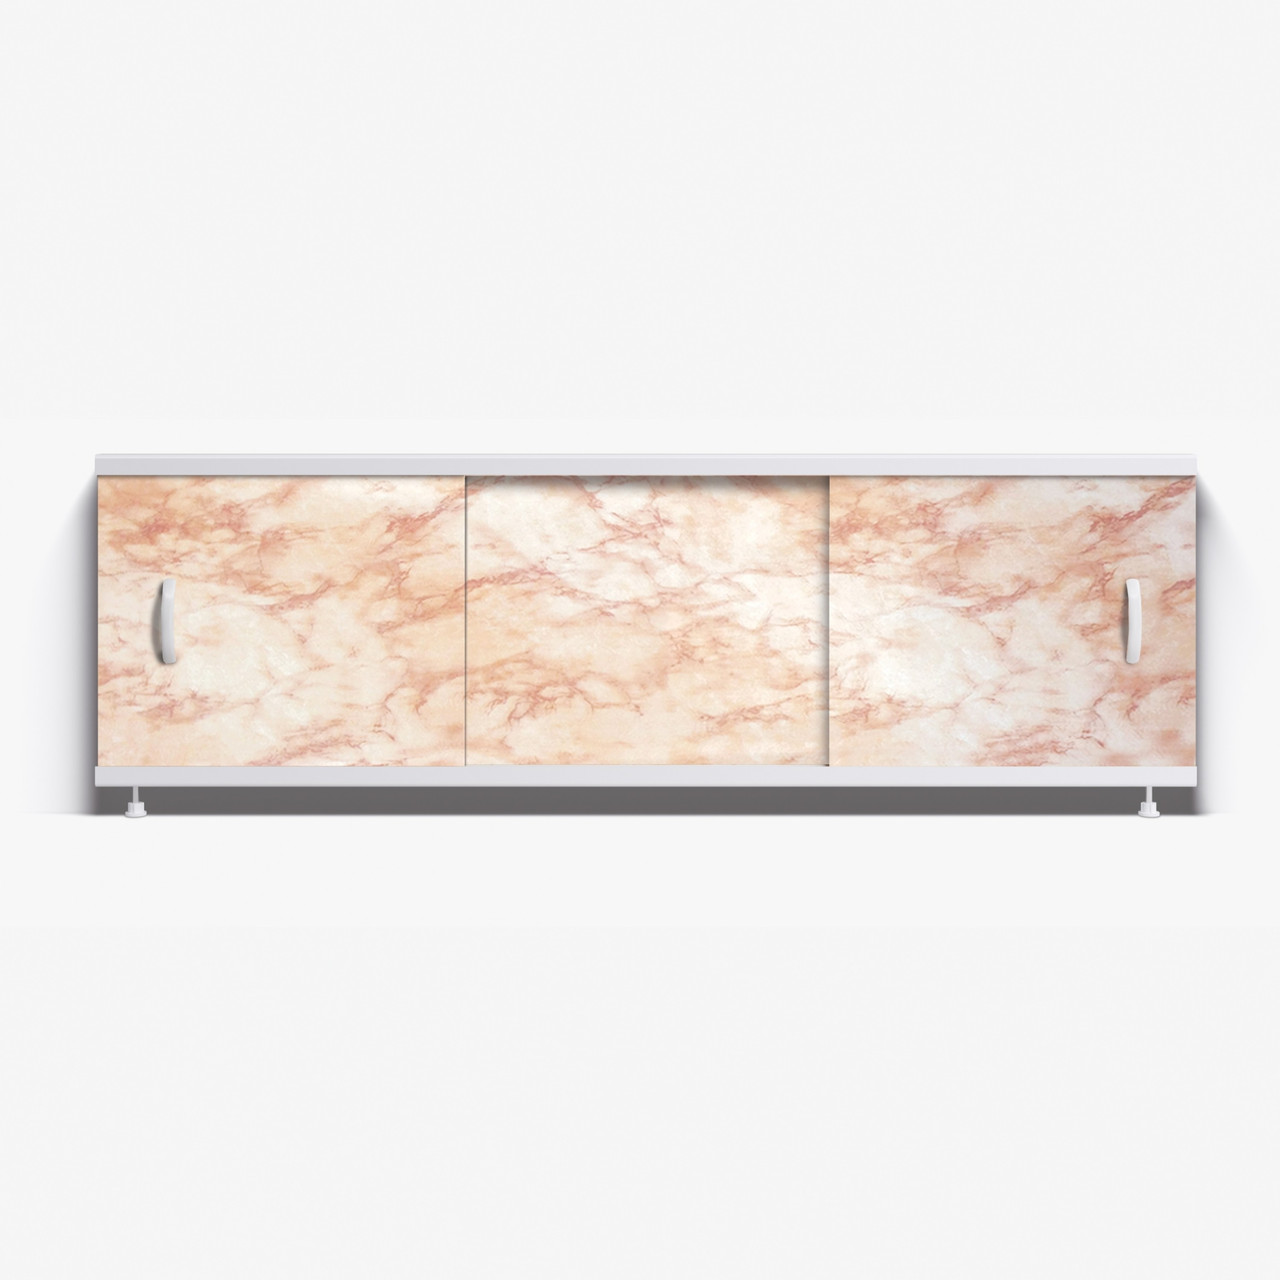 Панель для ванны Alavann Престиж 1.5 м   //  10 светло-коричневый мрамор